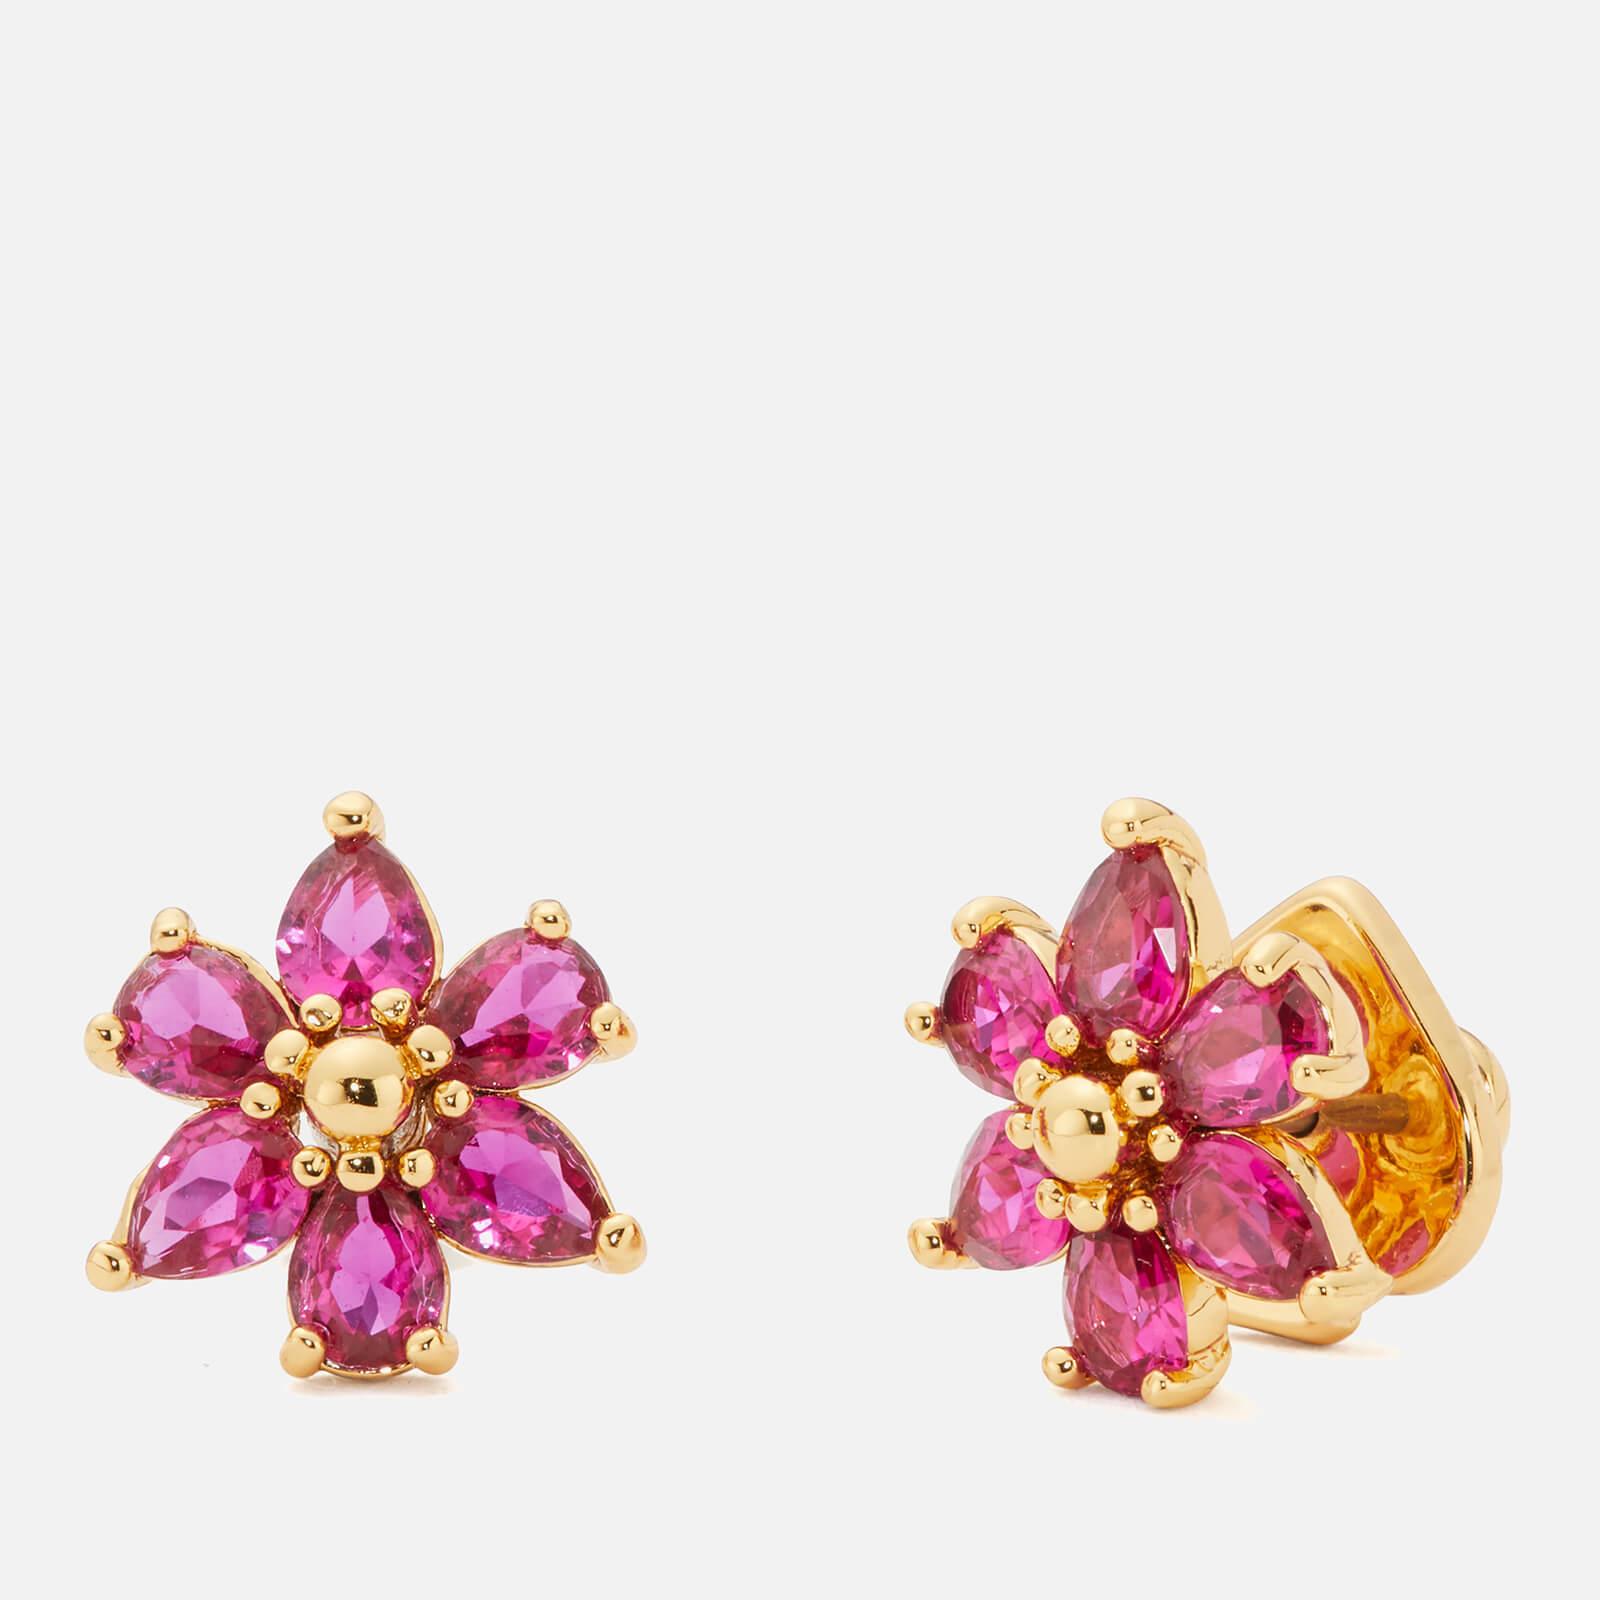 Kate Spade New York Women's First Bloom Studs - Pink